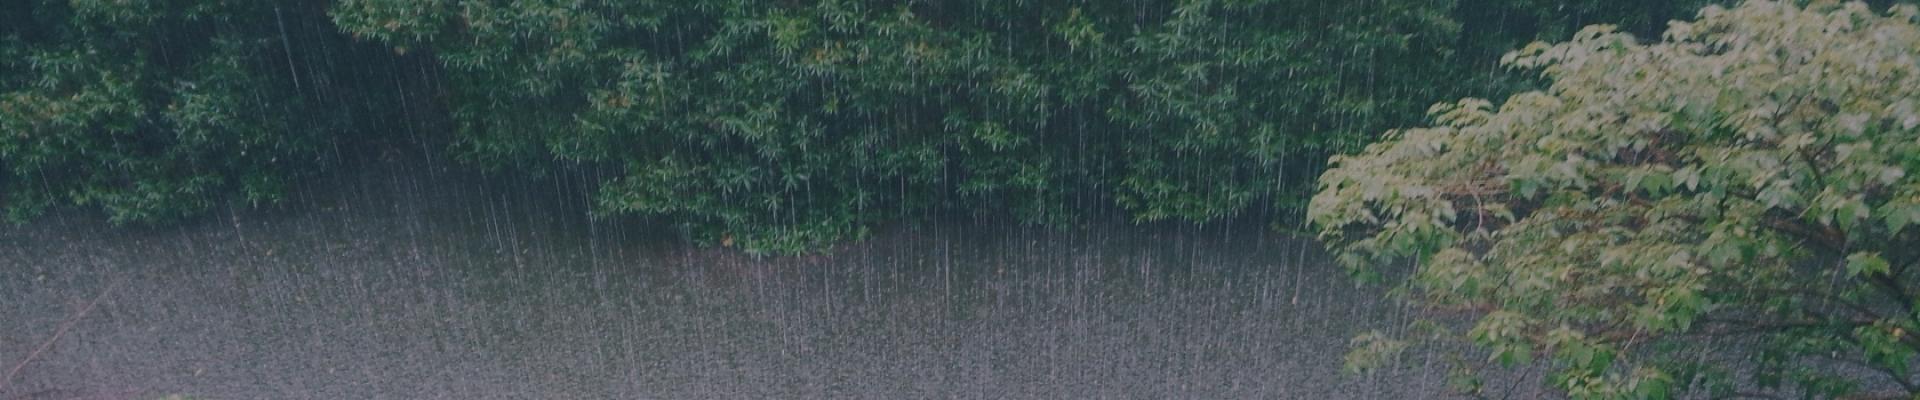 Monsoon Treks in India